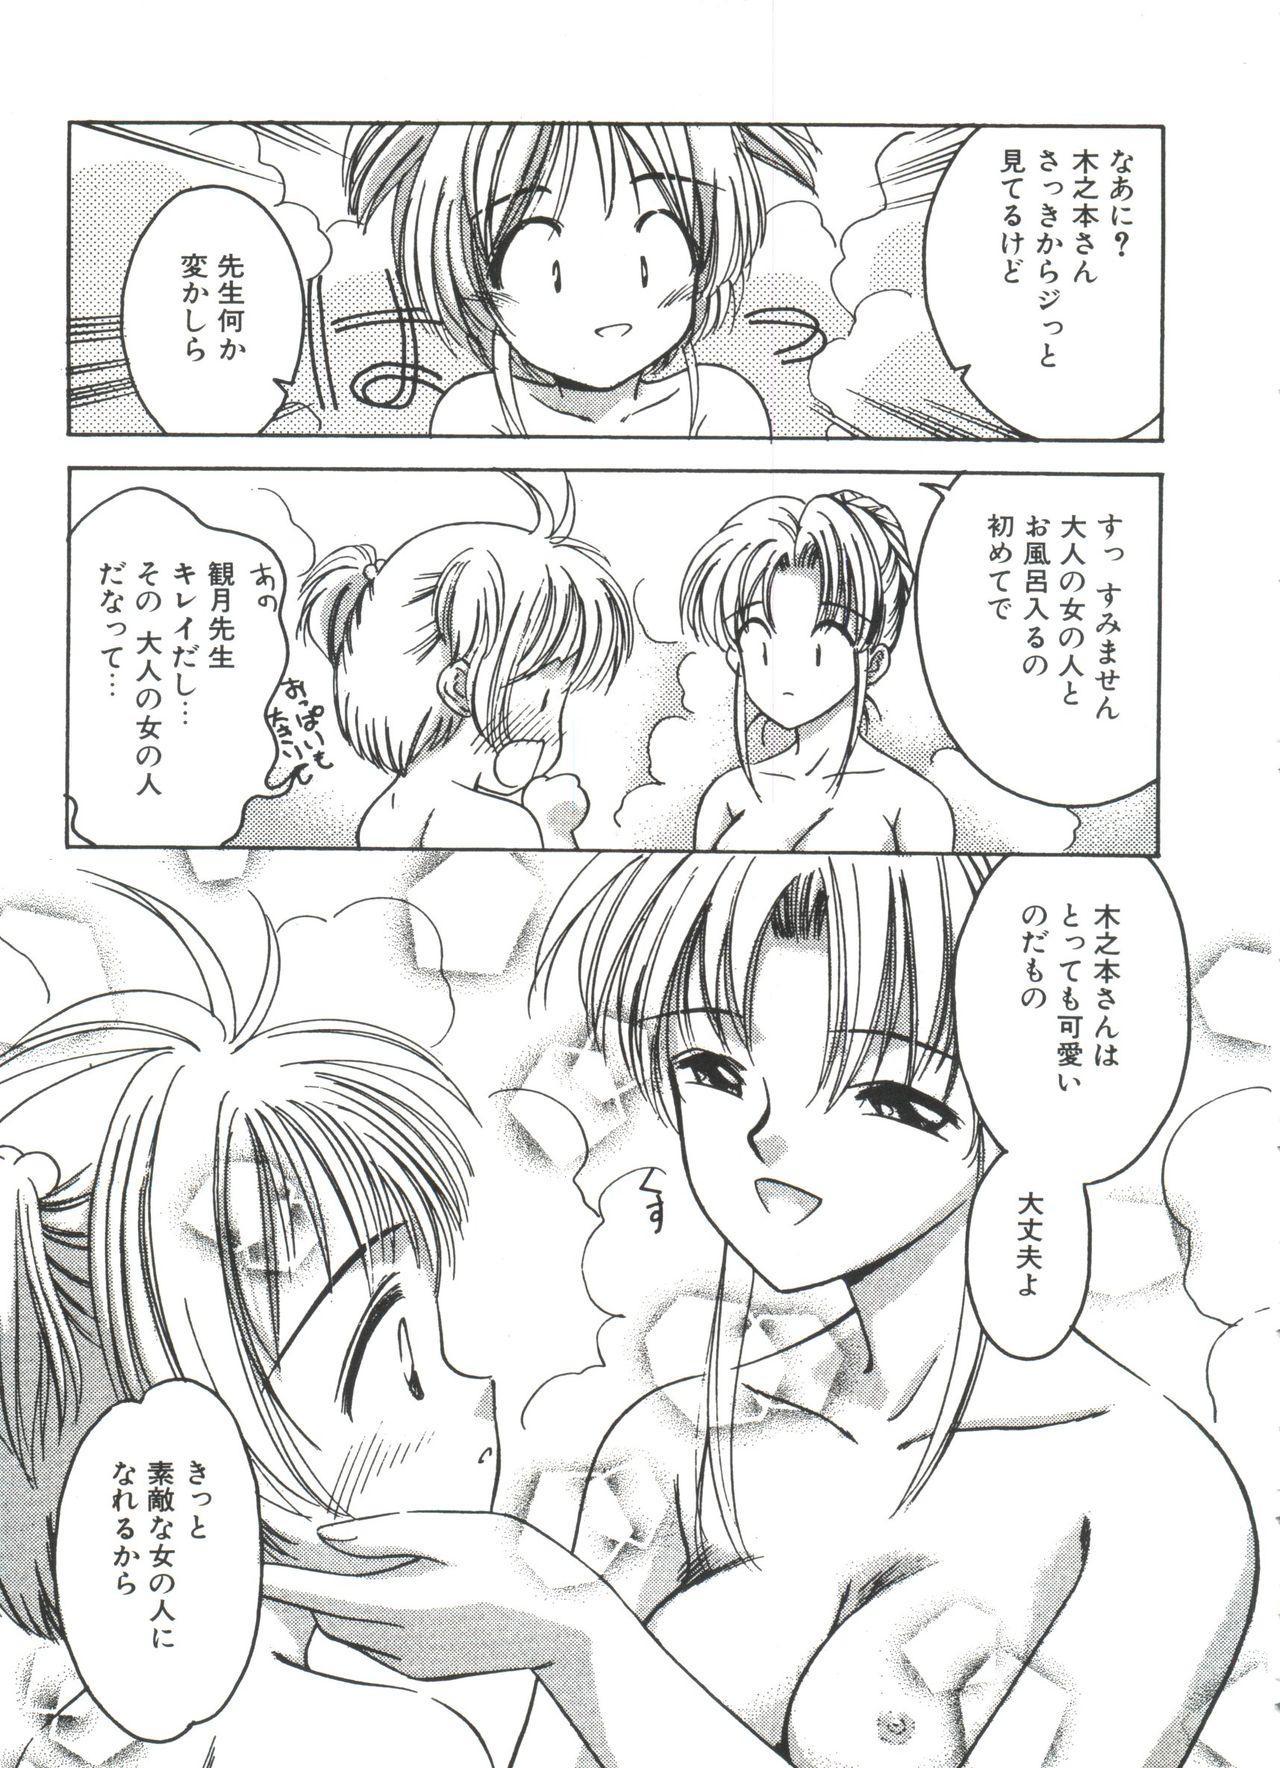 Ero-chan to Issho 2 8